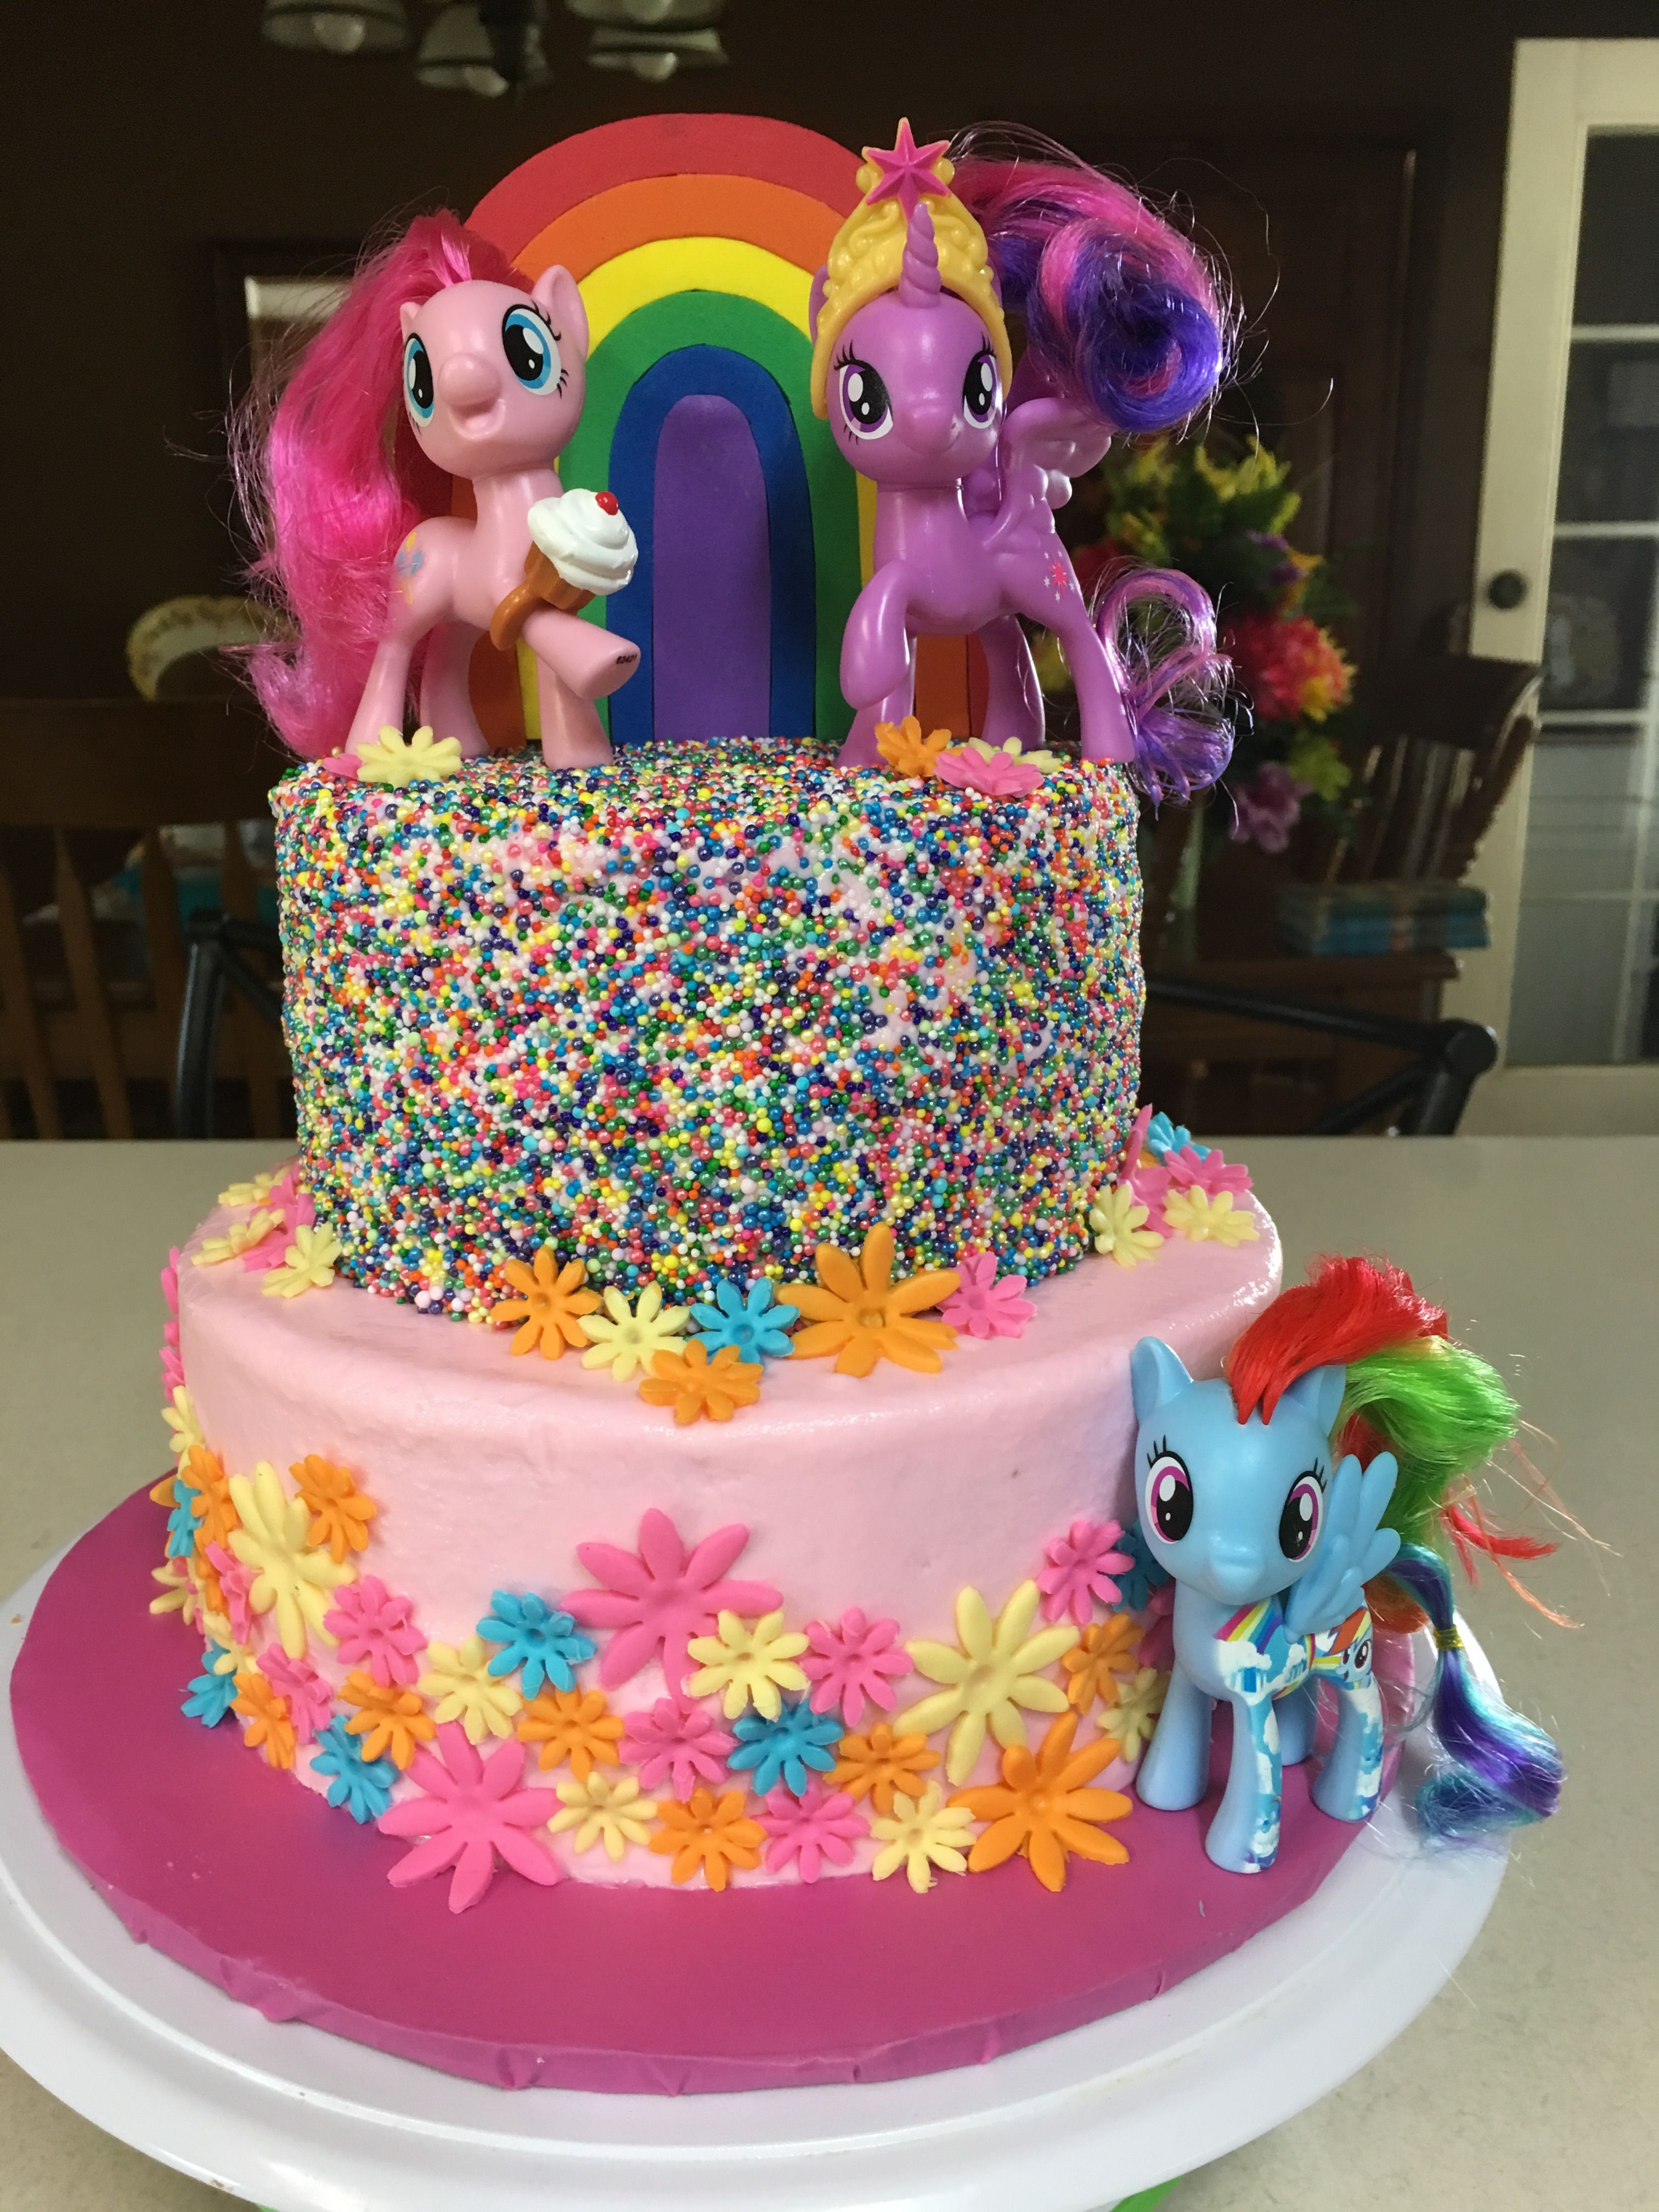 Brooklees 3rd birthday cake birthday birthdays